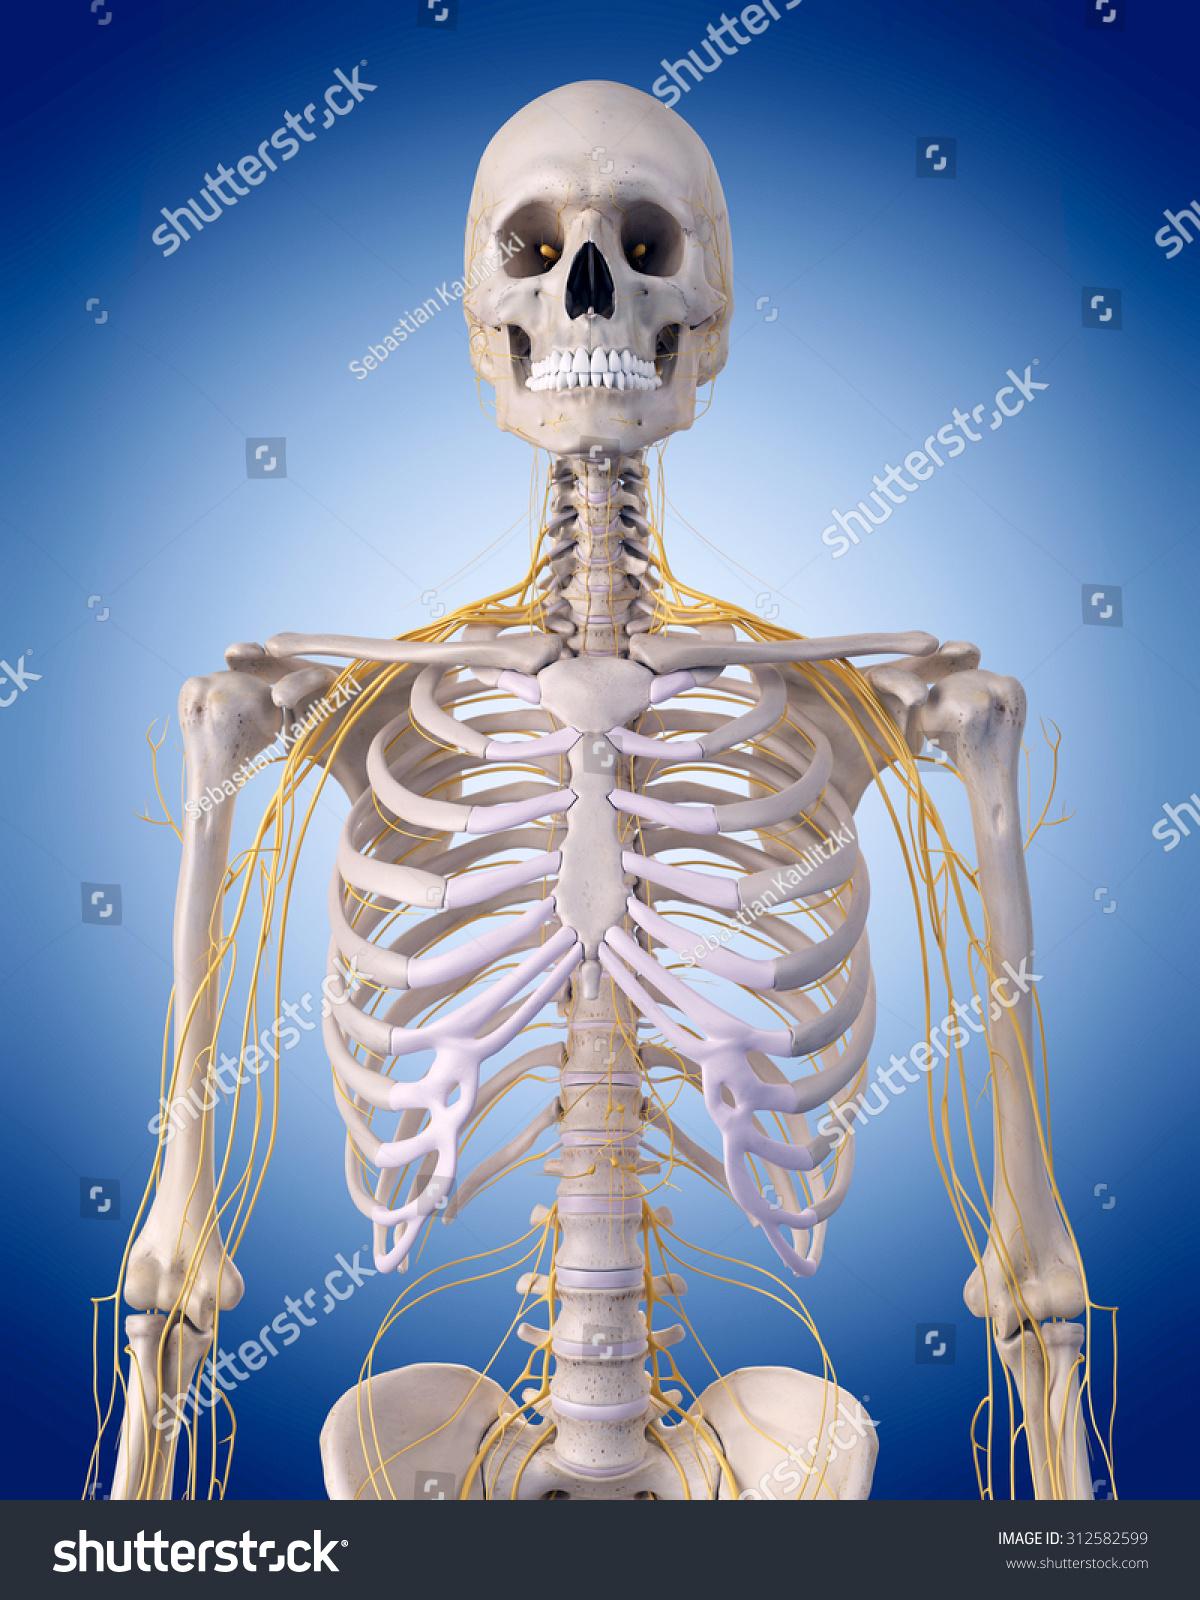 Medically Accurate Illustration Nerves Upper Body Stock Illustration